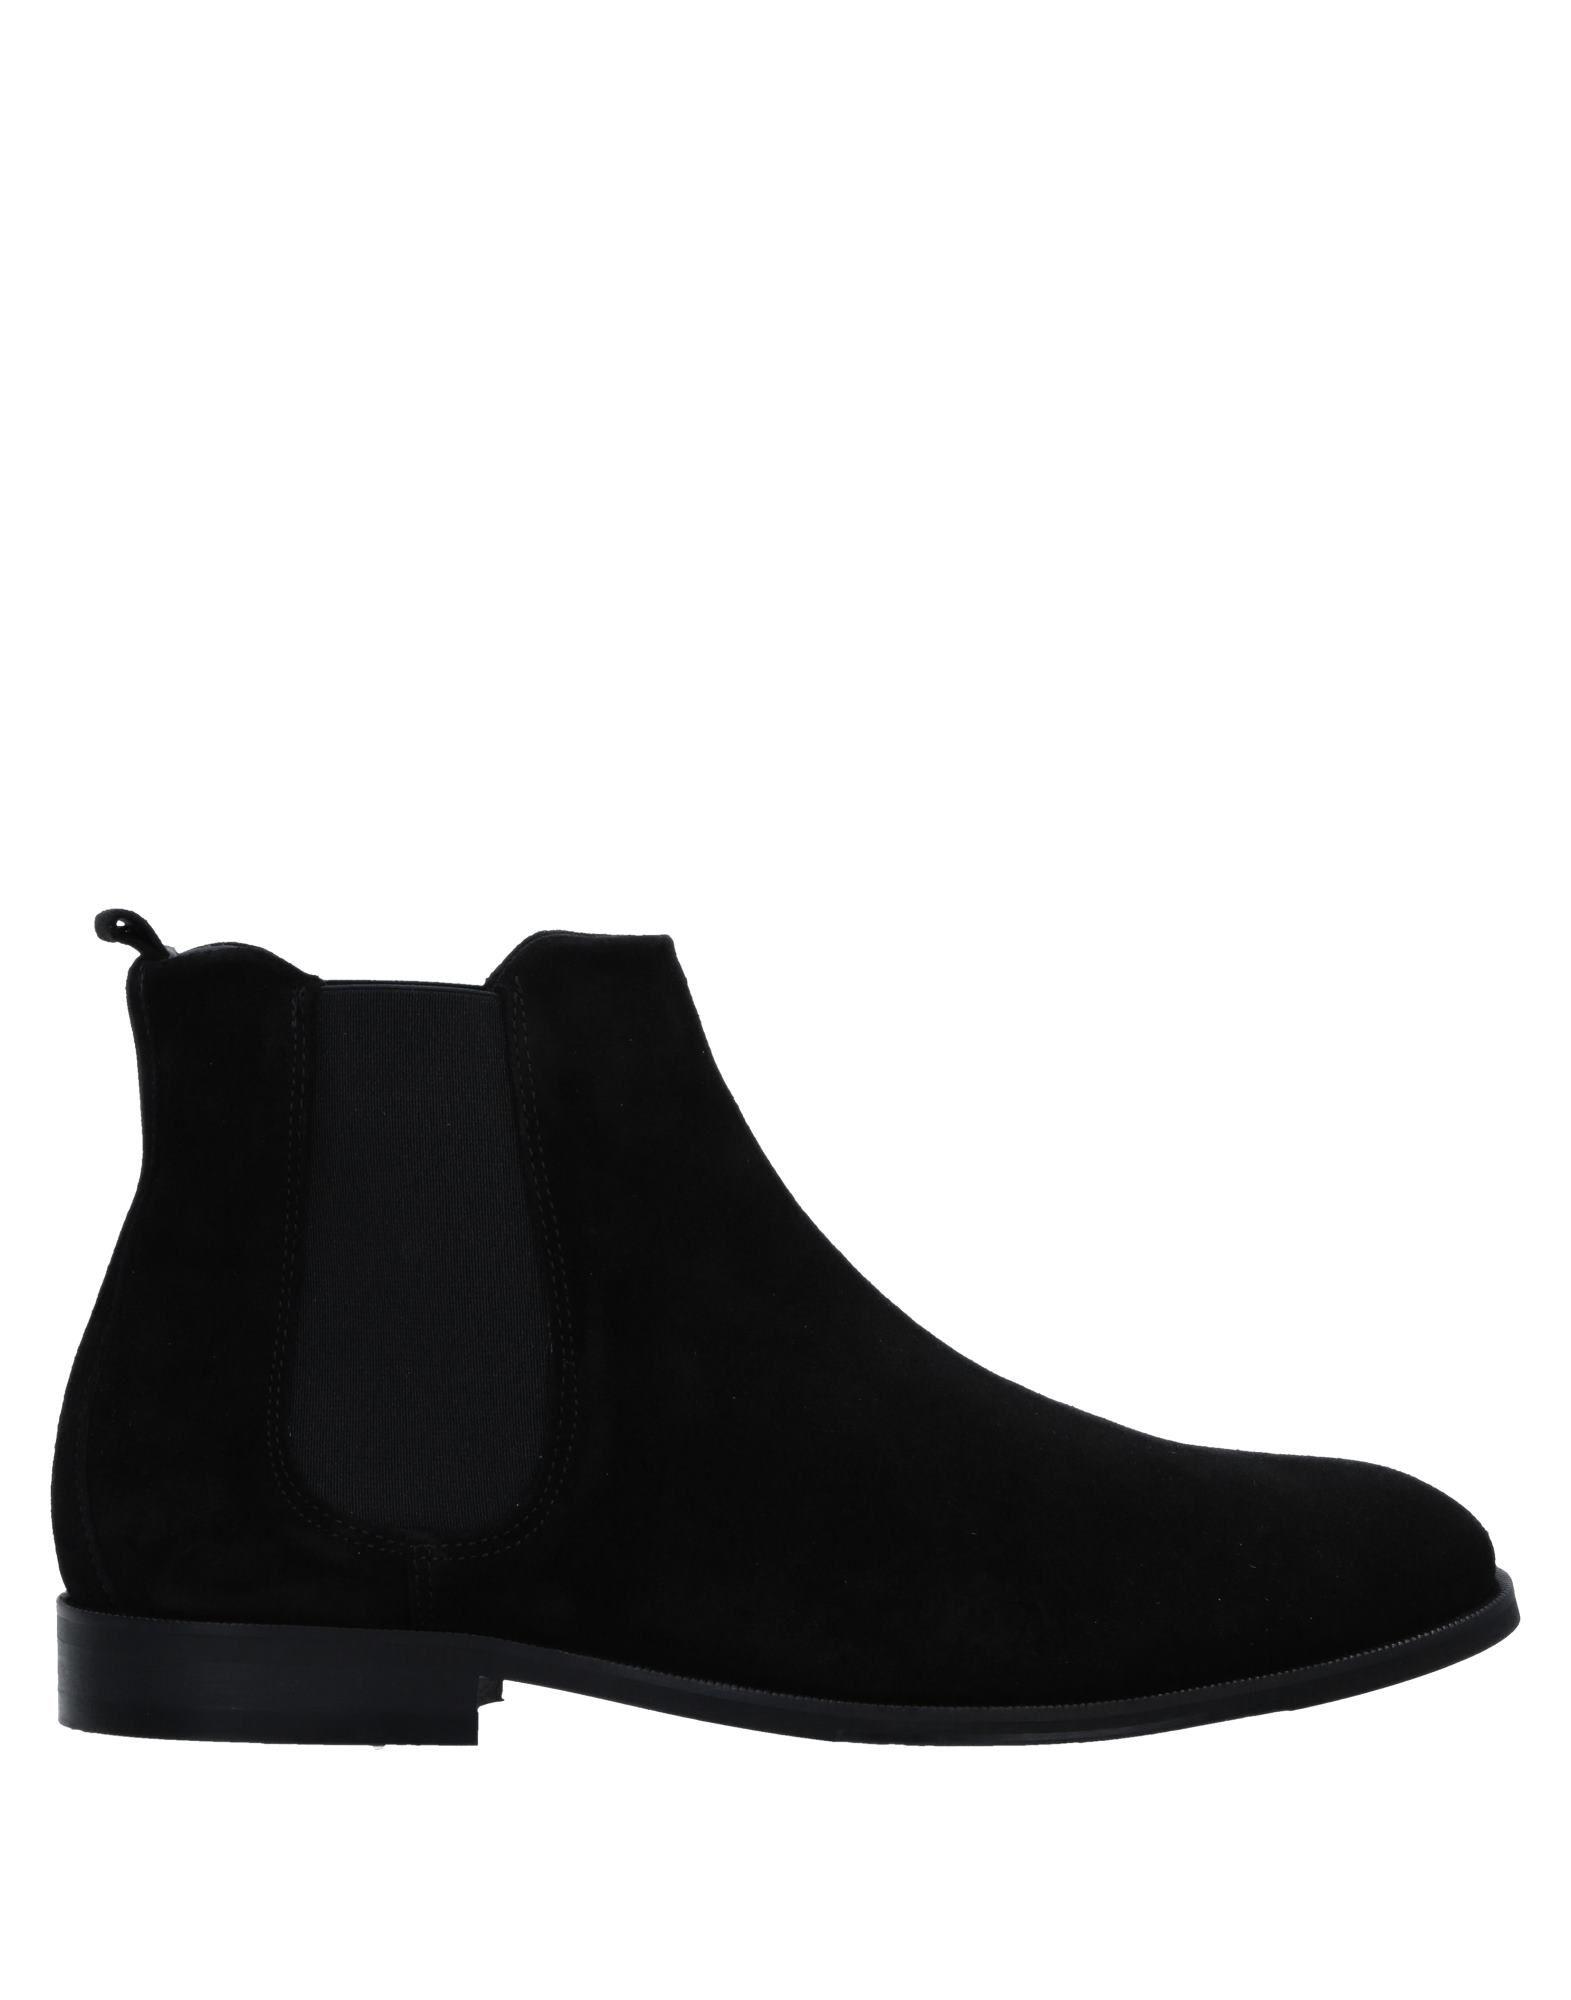 Royal Republiq Boots - Men Royal Republiq Republiq Republiq Boots online on  Australia - 11543791SJ 61209d